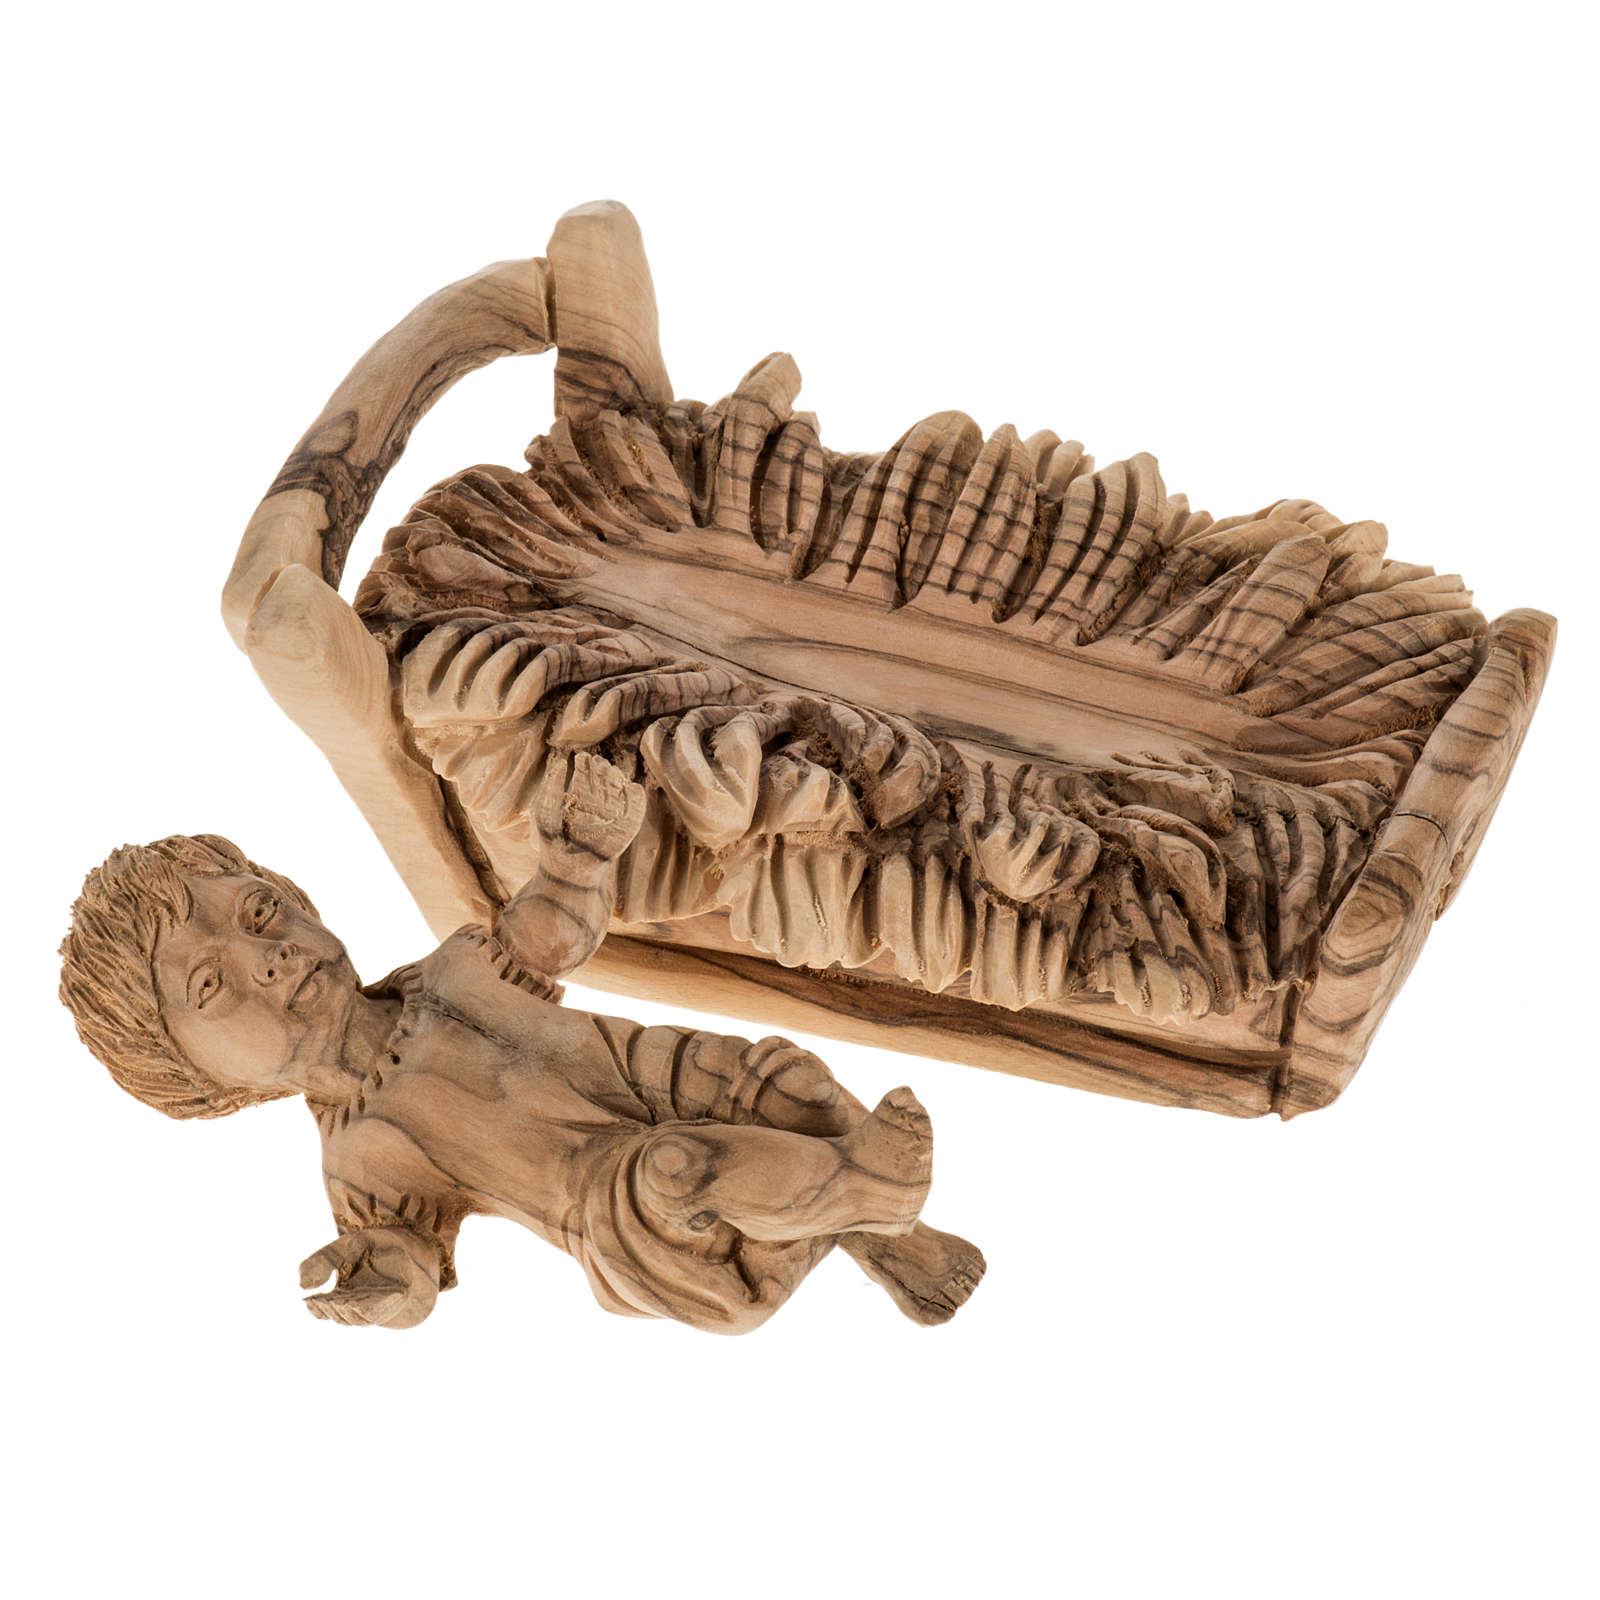 Presepe completo legno olivo Betlemme 30 cm 4